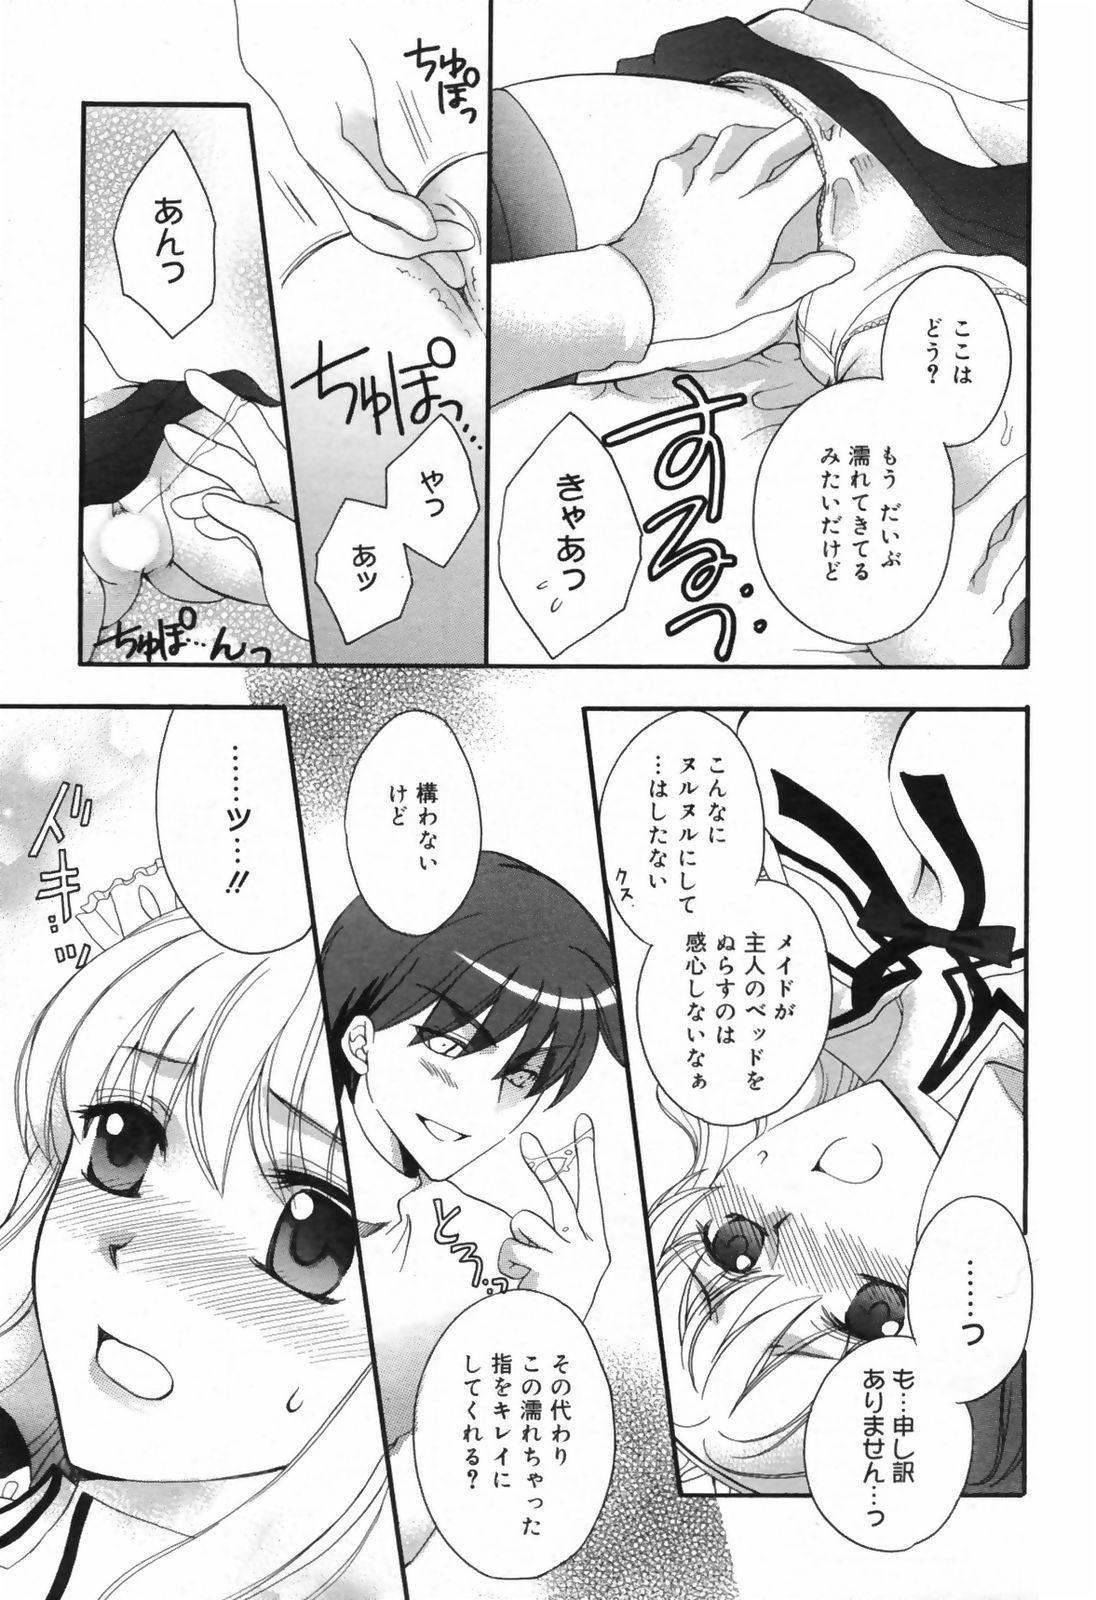 Manga Bangaichi 2009-02 Vol. 234 214